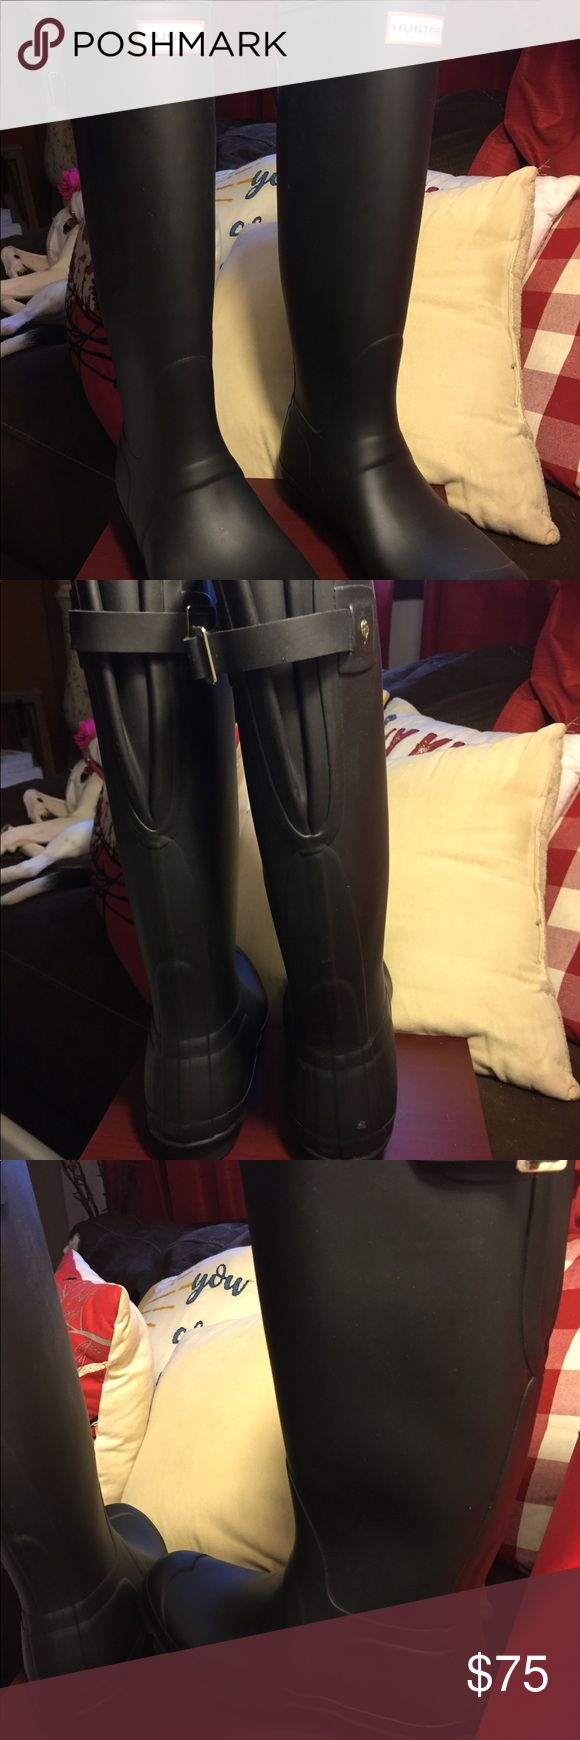 Hunter Orig Adjustable Womens Wide Wellies Black Original Adjustable Womens Wide Fit Wellington Boots Wellies (Black  - WFT1001BLK,UK 8 / EU 42]  size 8, worn once! EUC Hunter Shoes Winter & Rain Boots